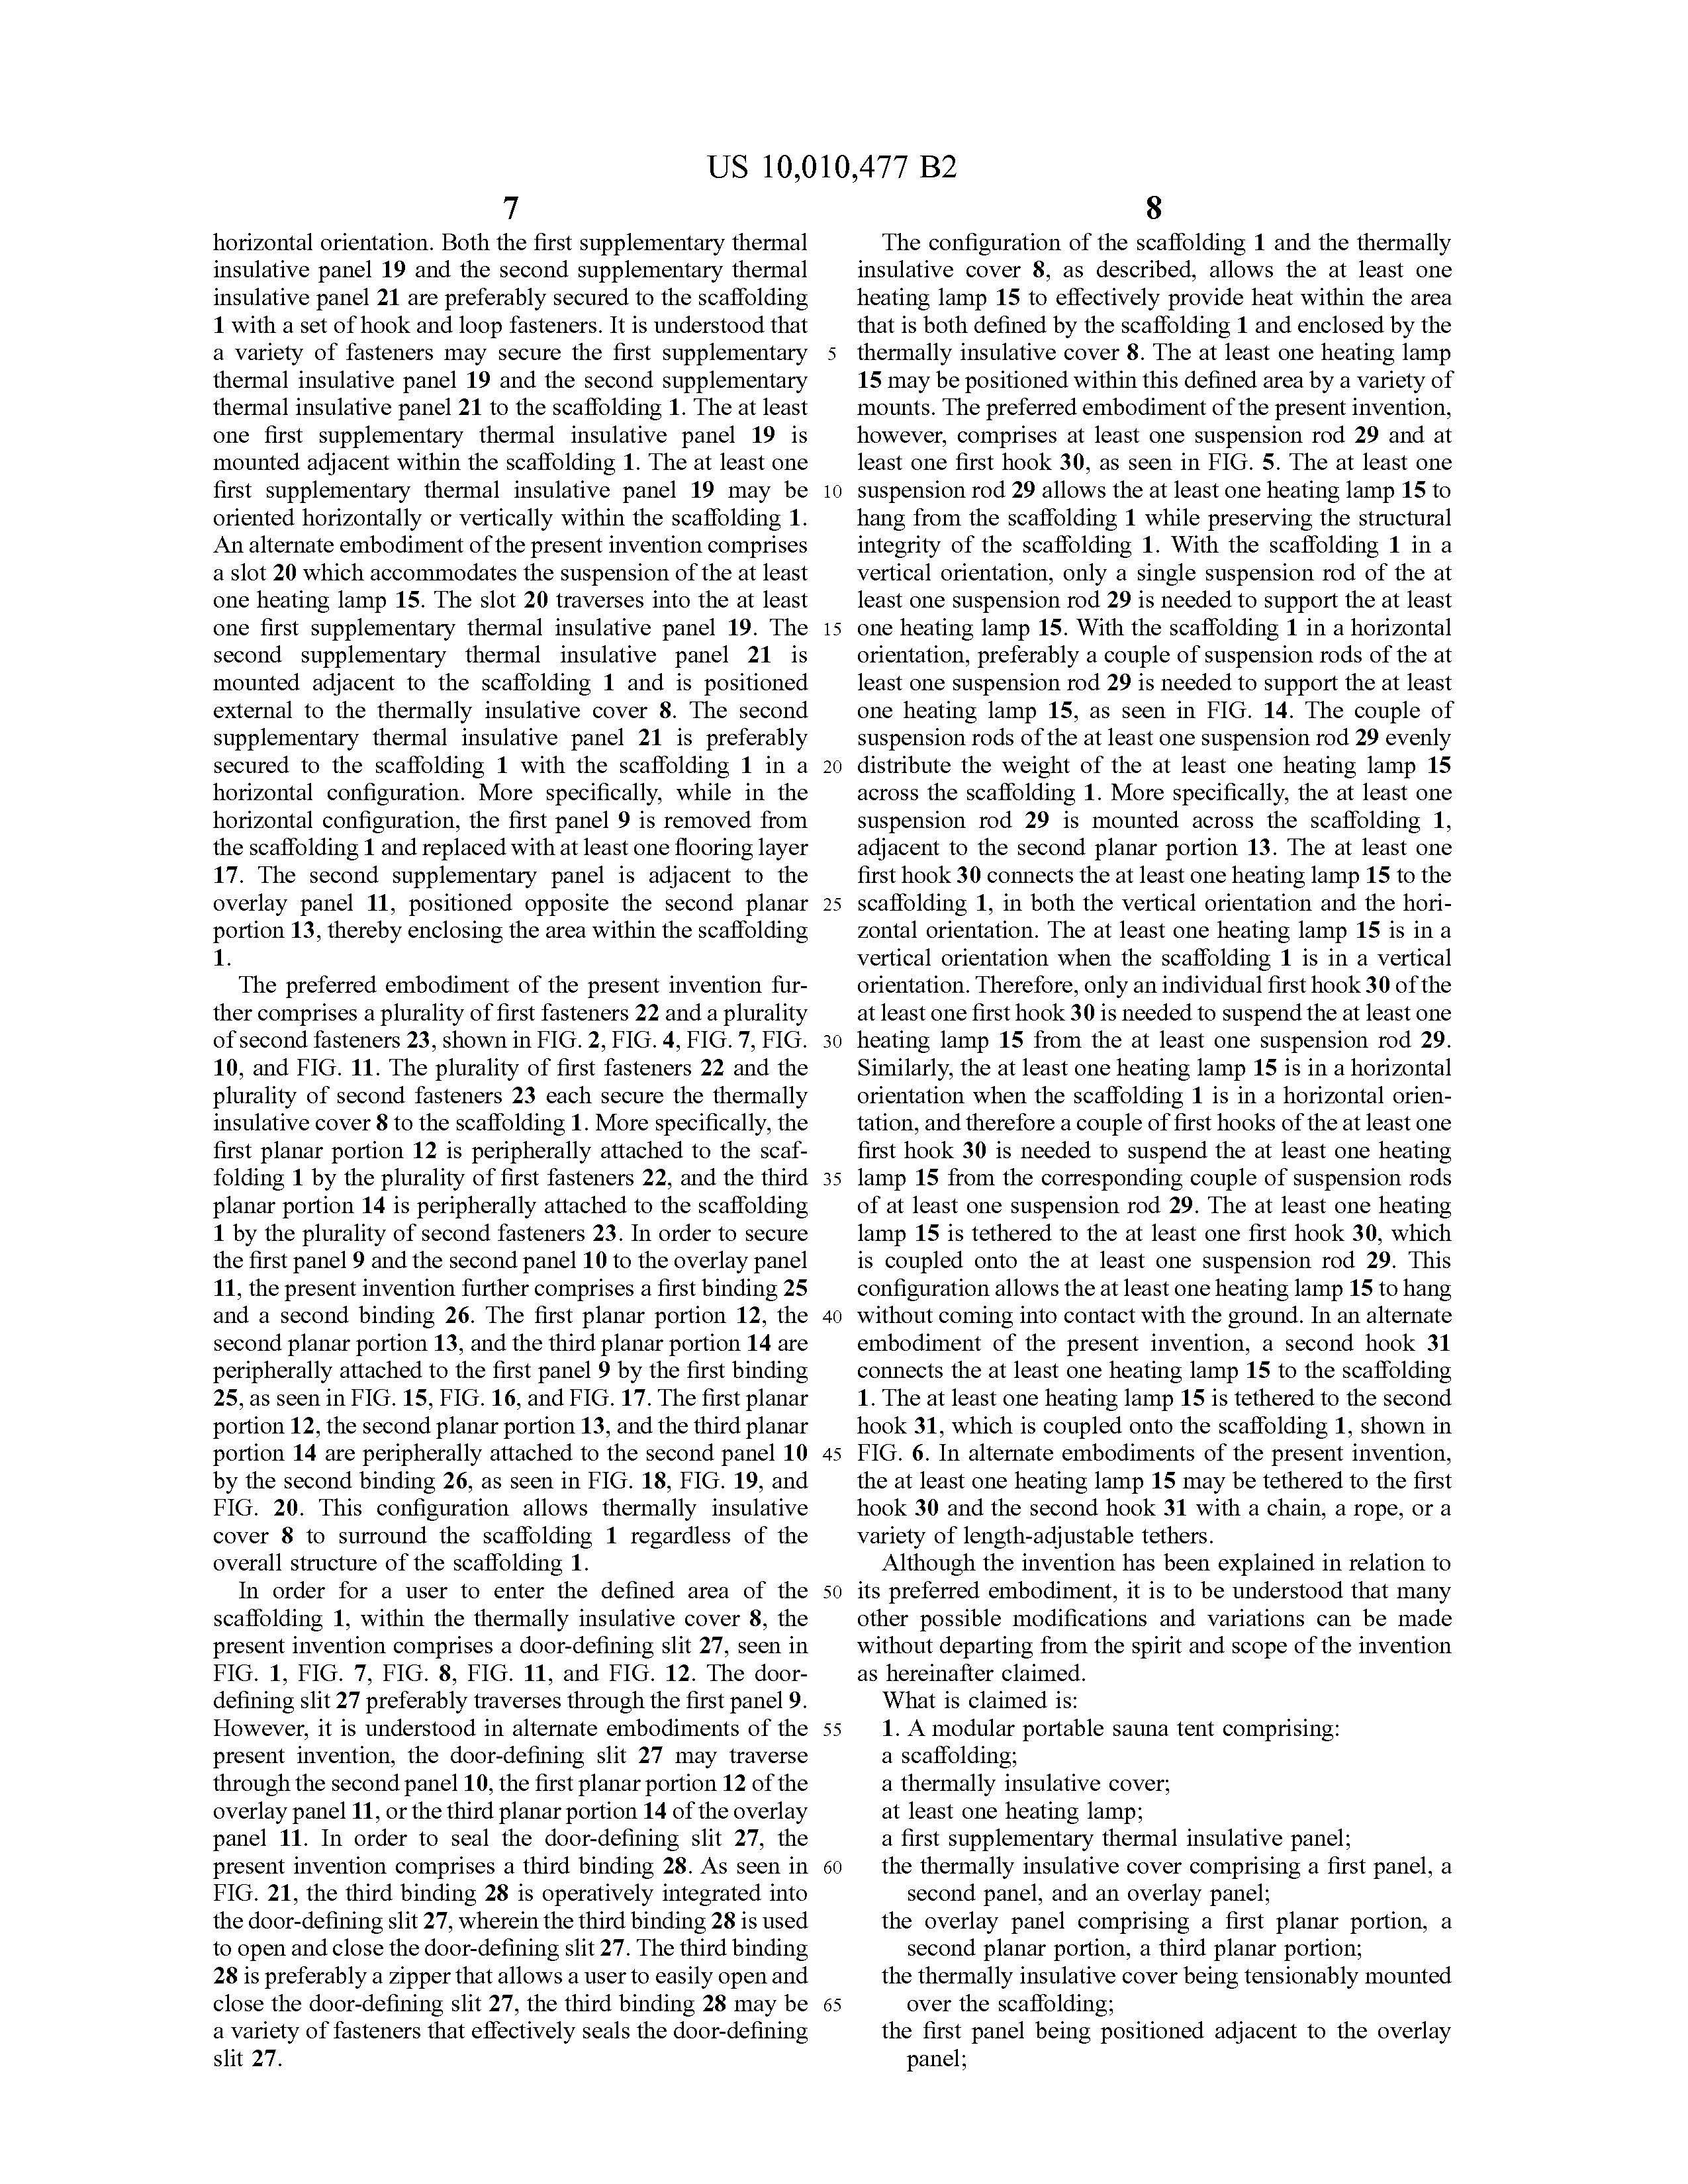 Sauna Tent Patent Page 28